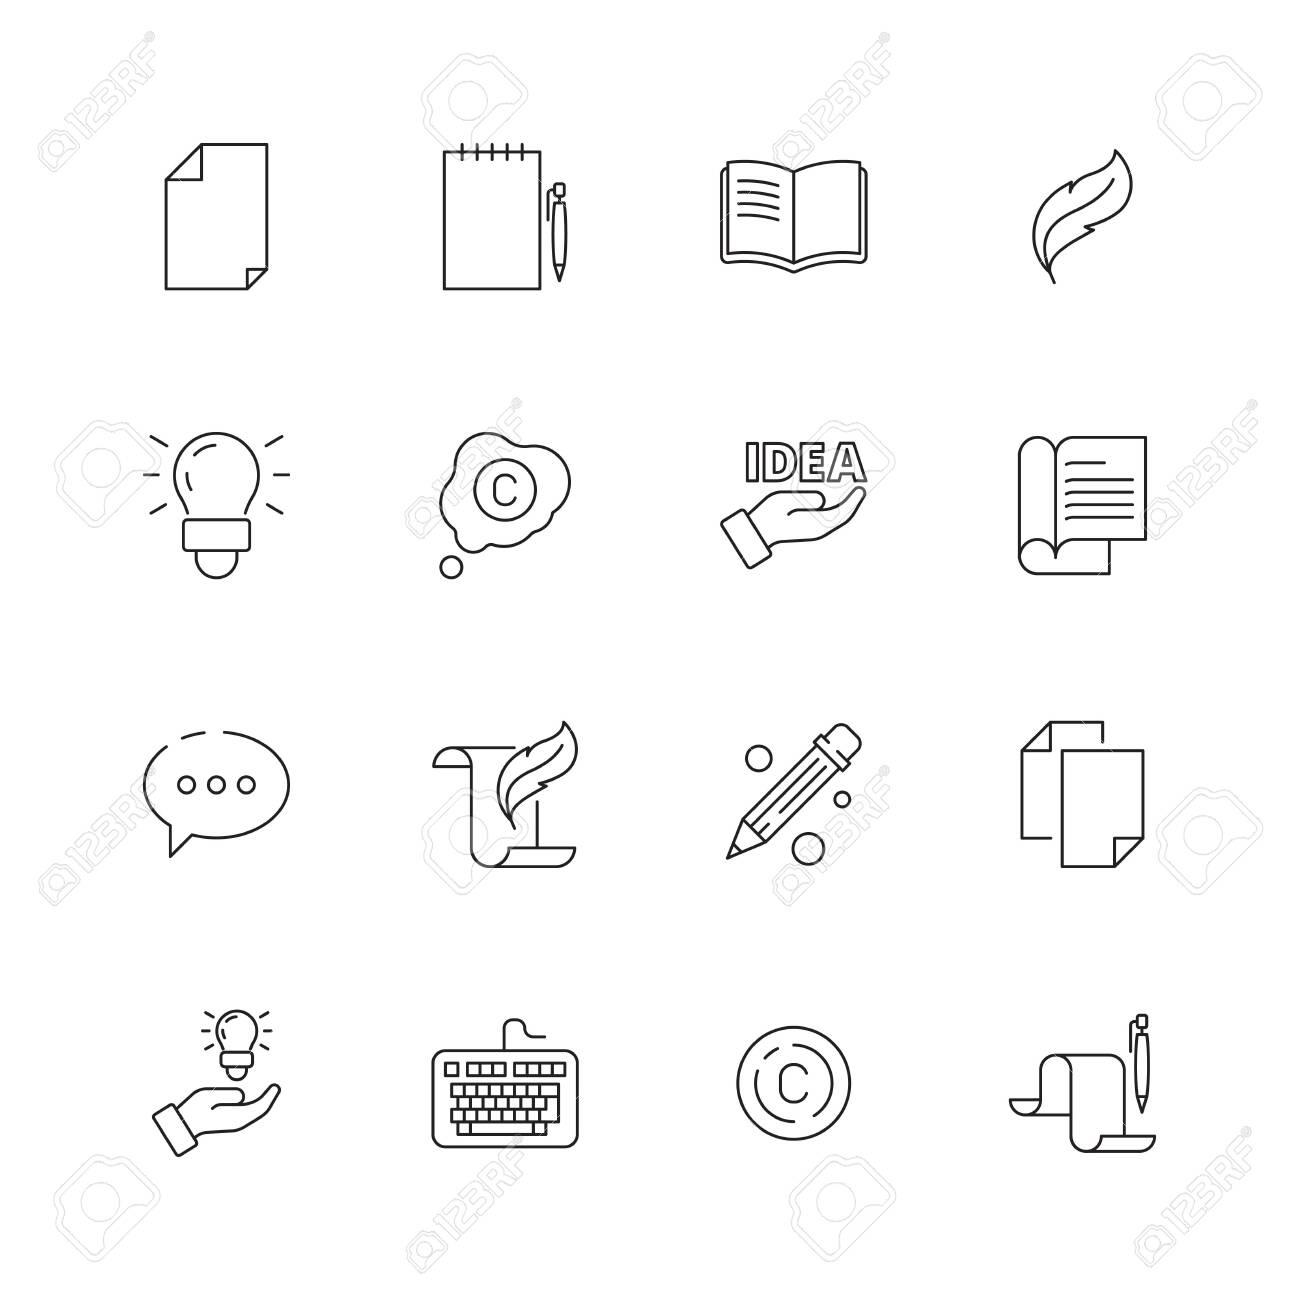 Copywriting icon  Writing creative articles book pen symbols